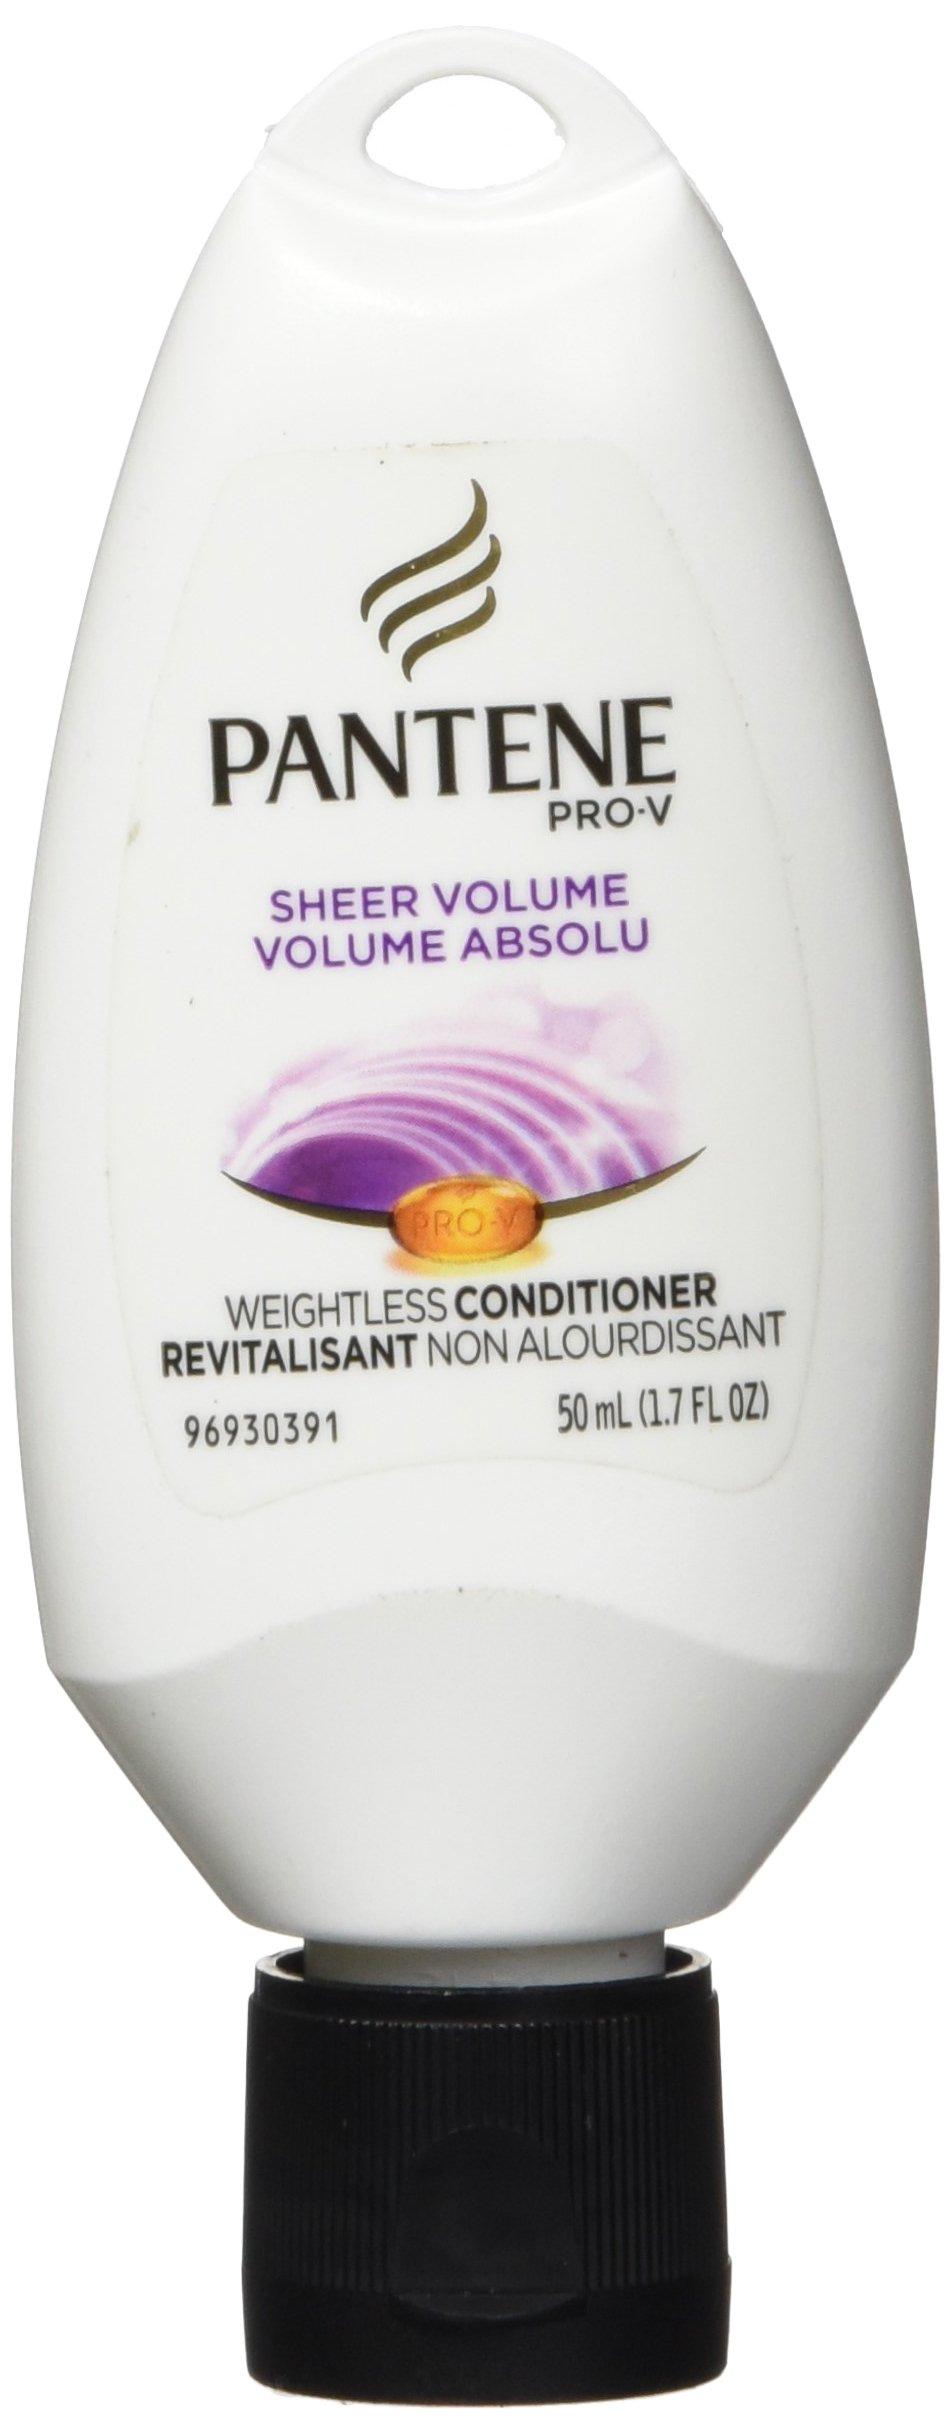 Pantene Flat Shampoo 1 7 Oz Amazon Com Grocery